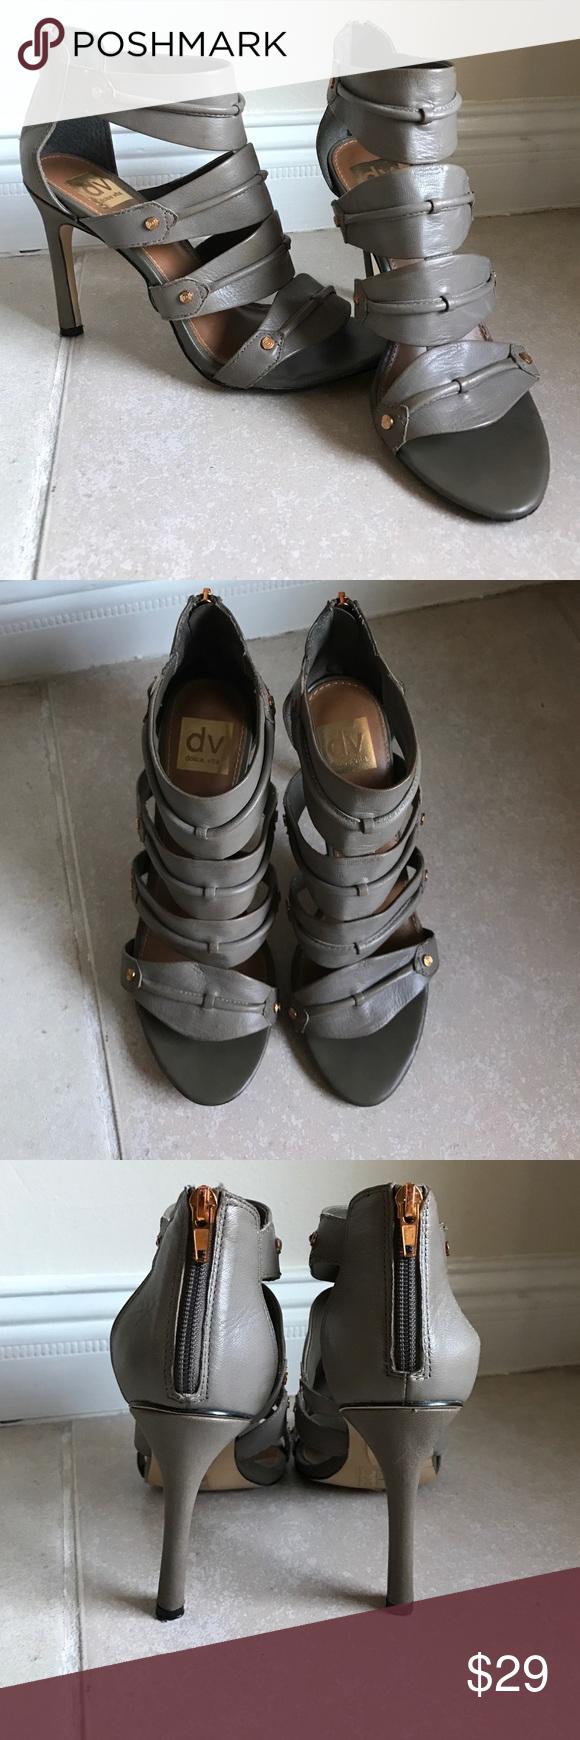 DOLCE VITA HEELS SIZE 9 SIZE women's 9 DV by Dolce Vita Shoes Heels